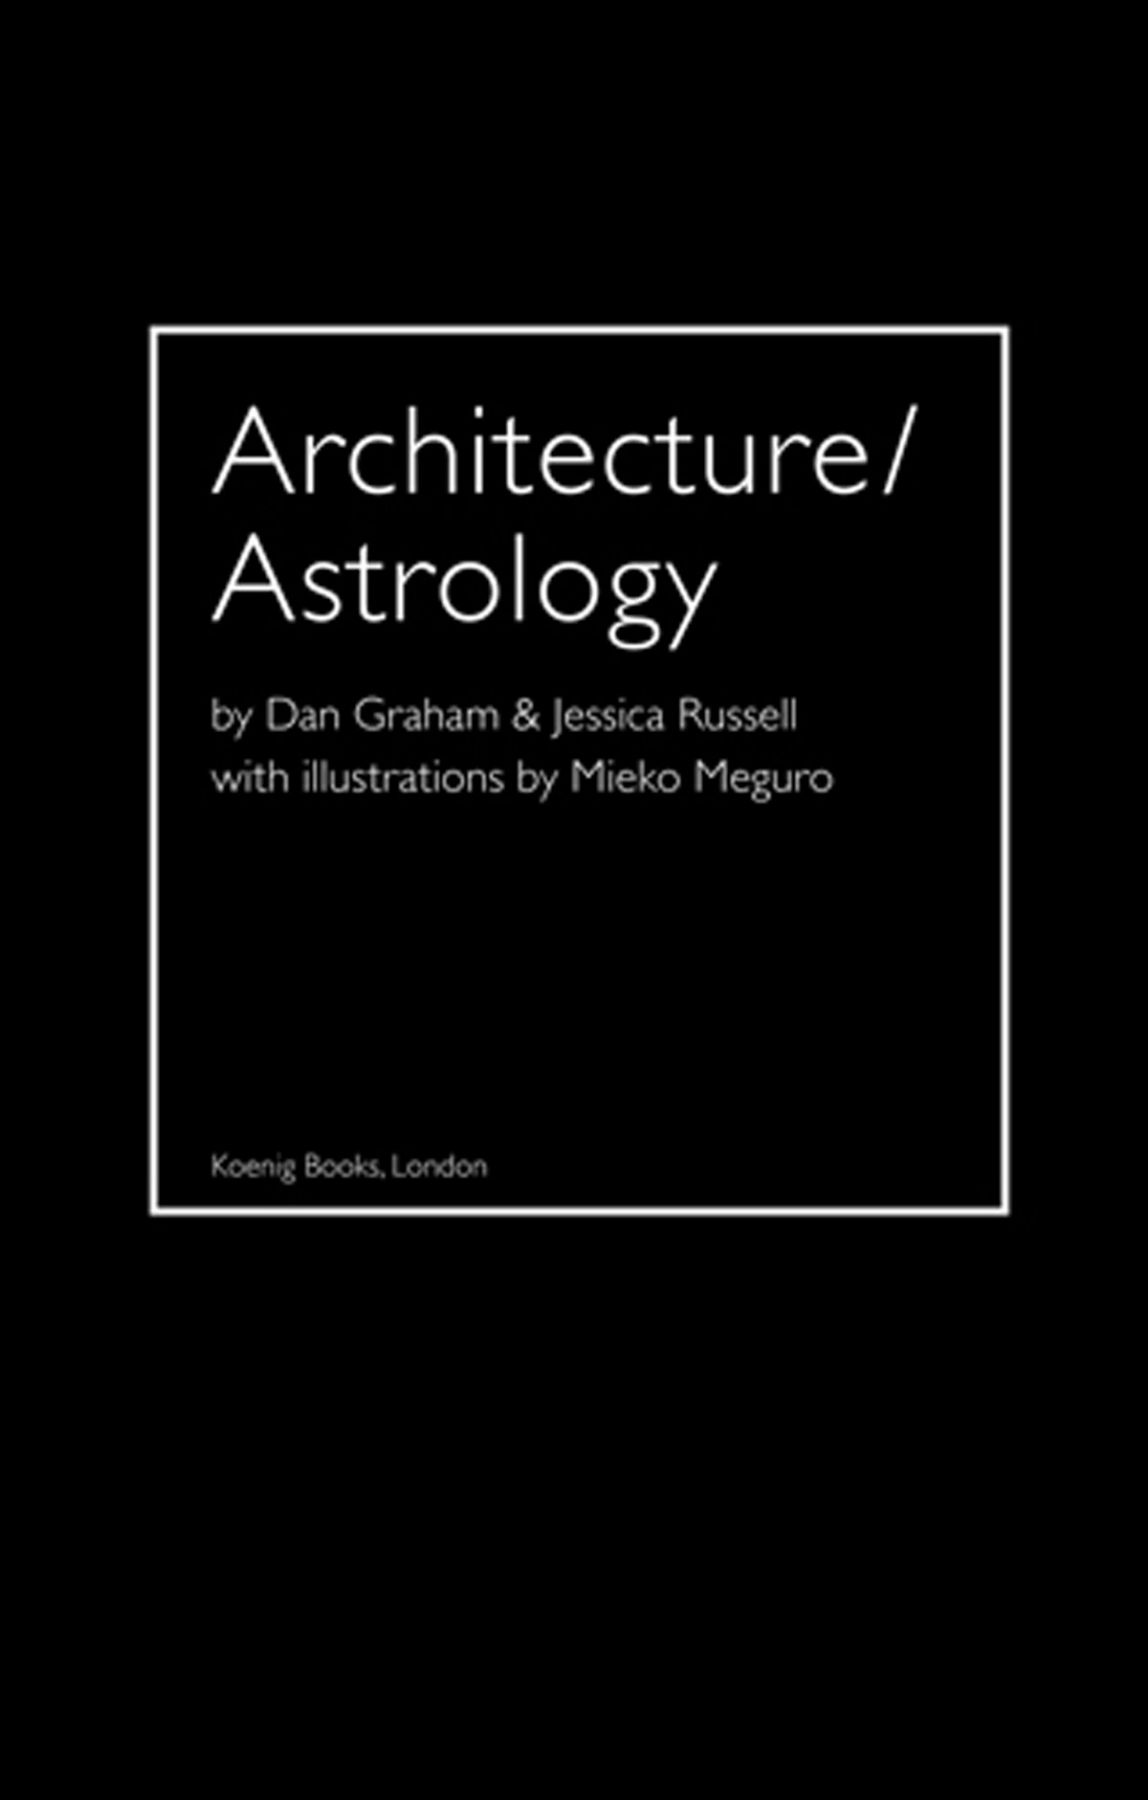 Oculus Book Talk:Architecture/Astrology